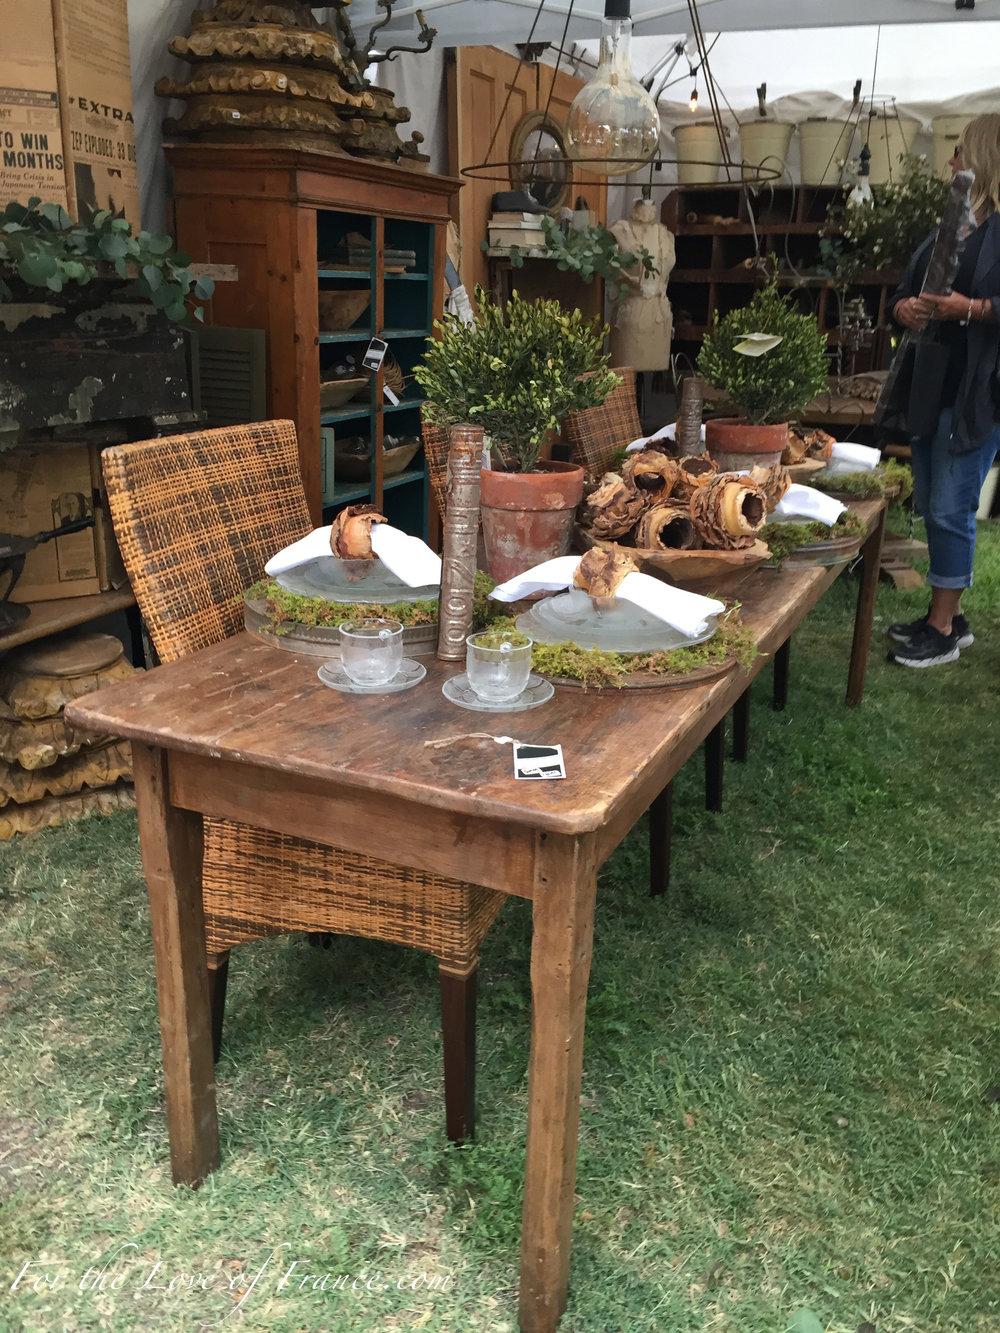 Vintage farm table set with autumn decor